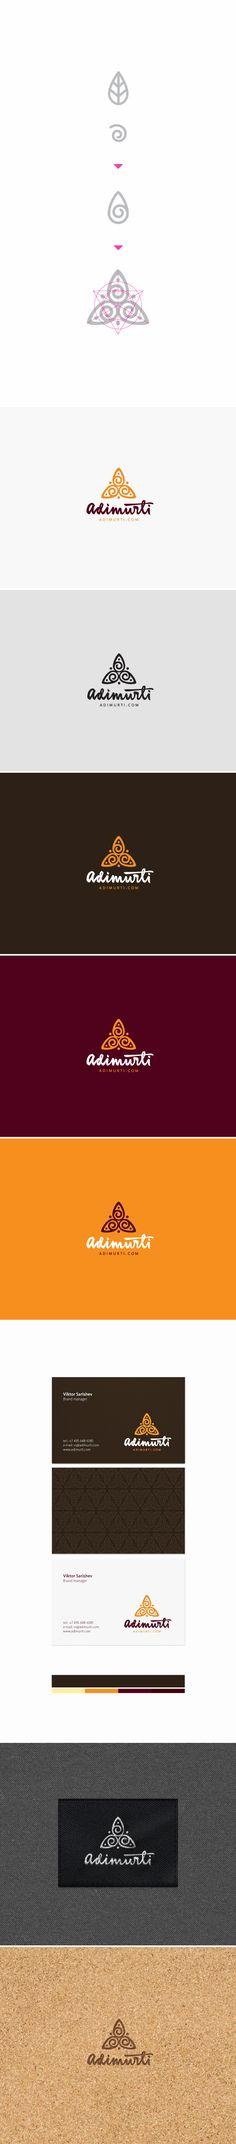 Adimurti on the Behance Network